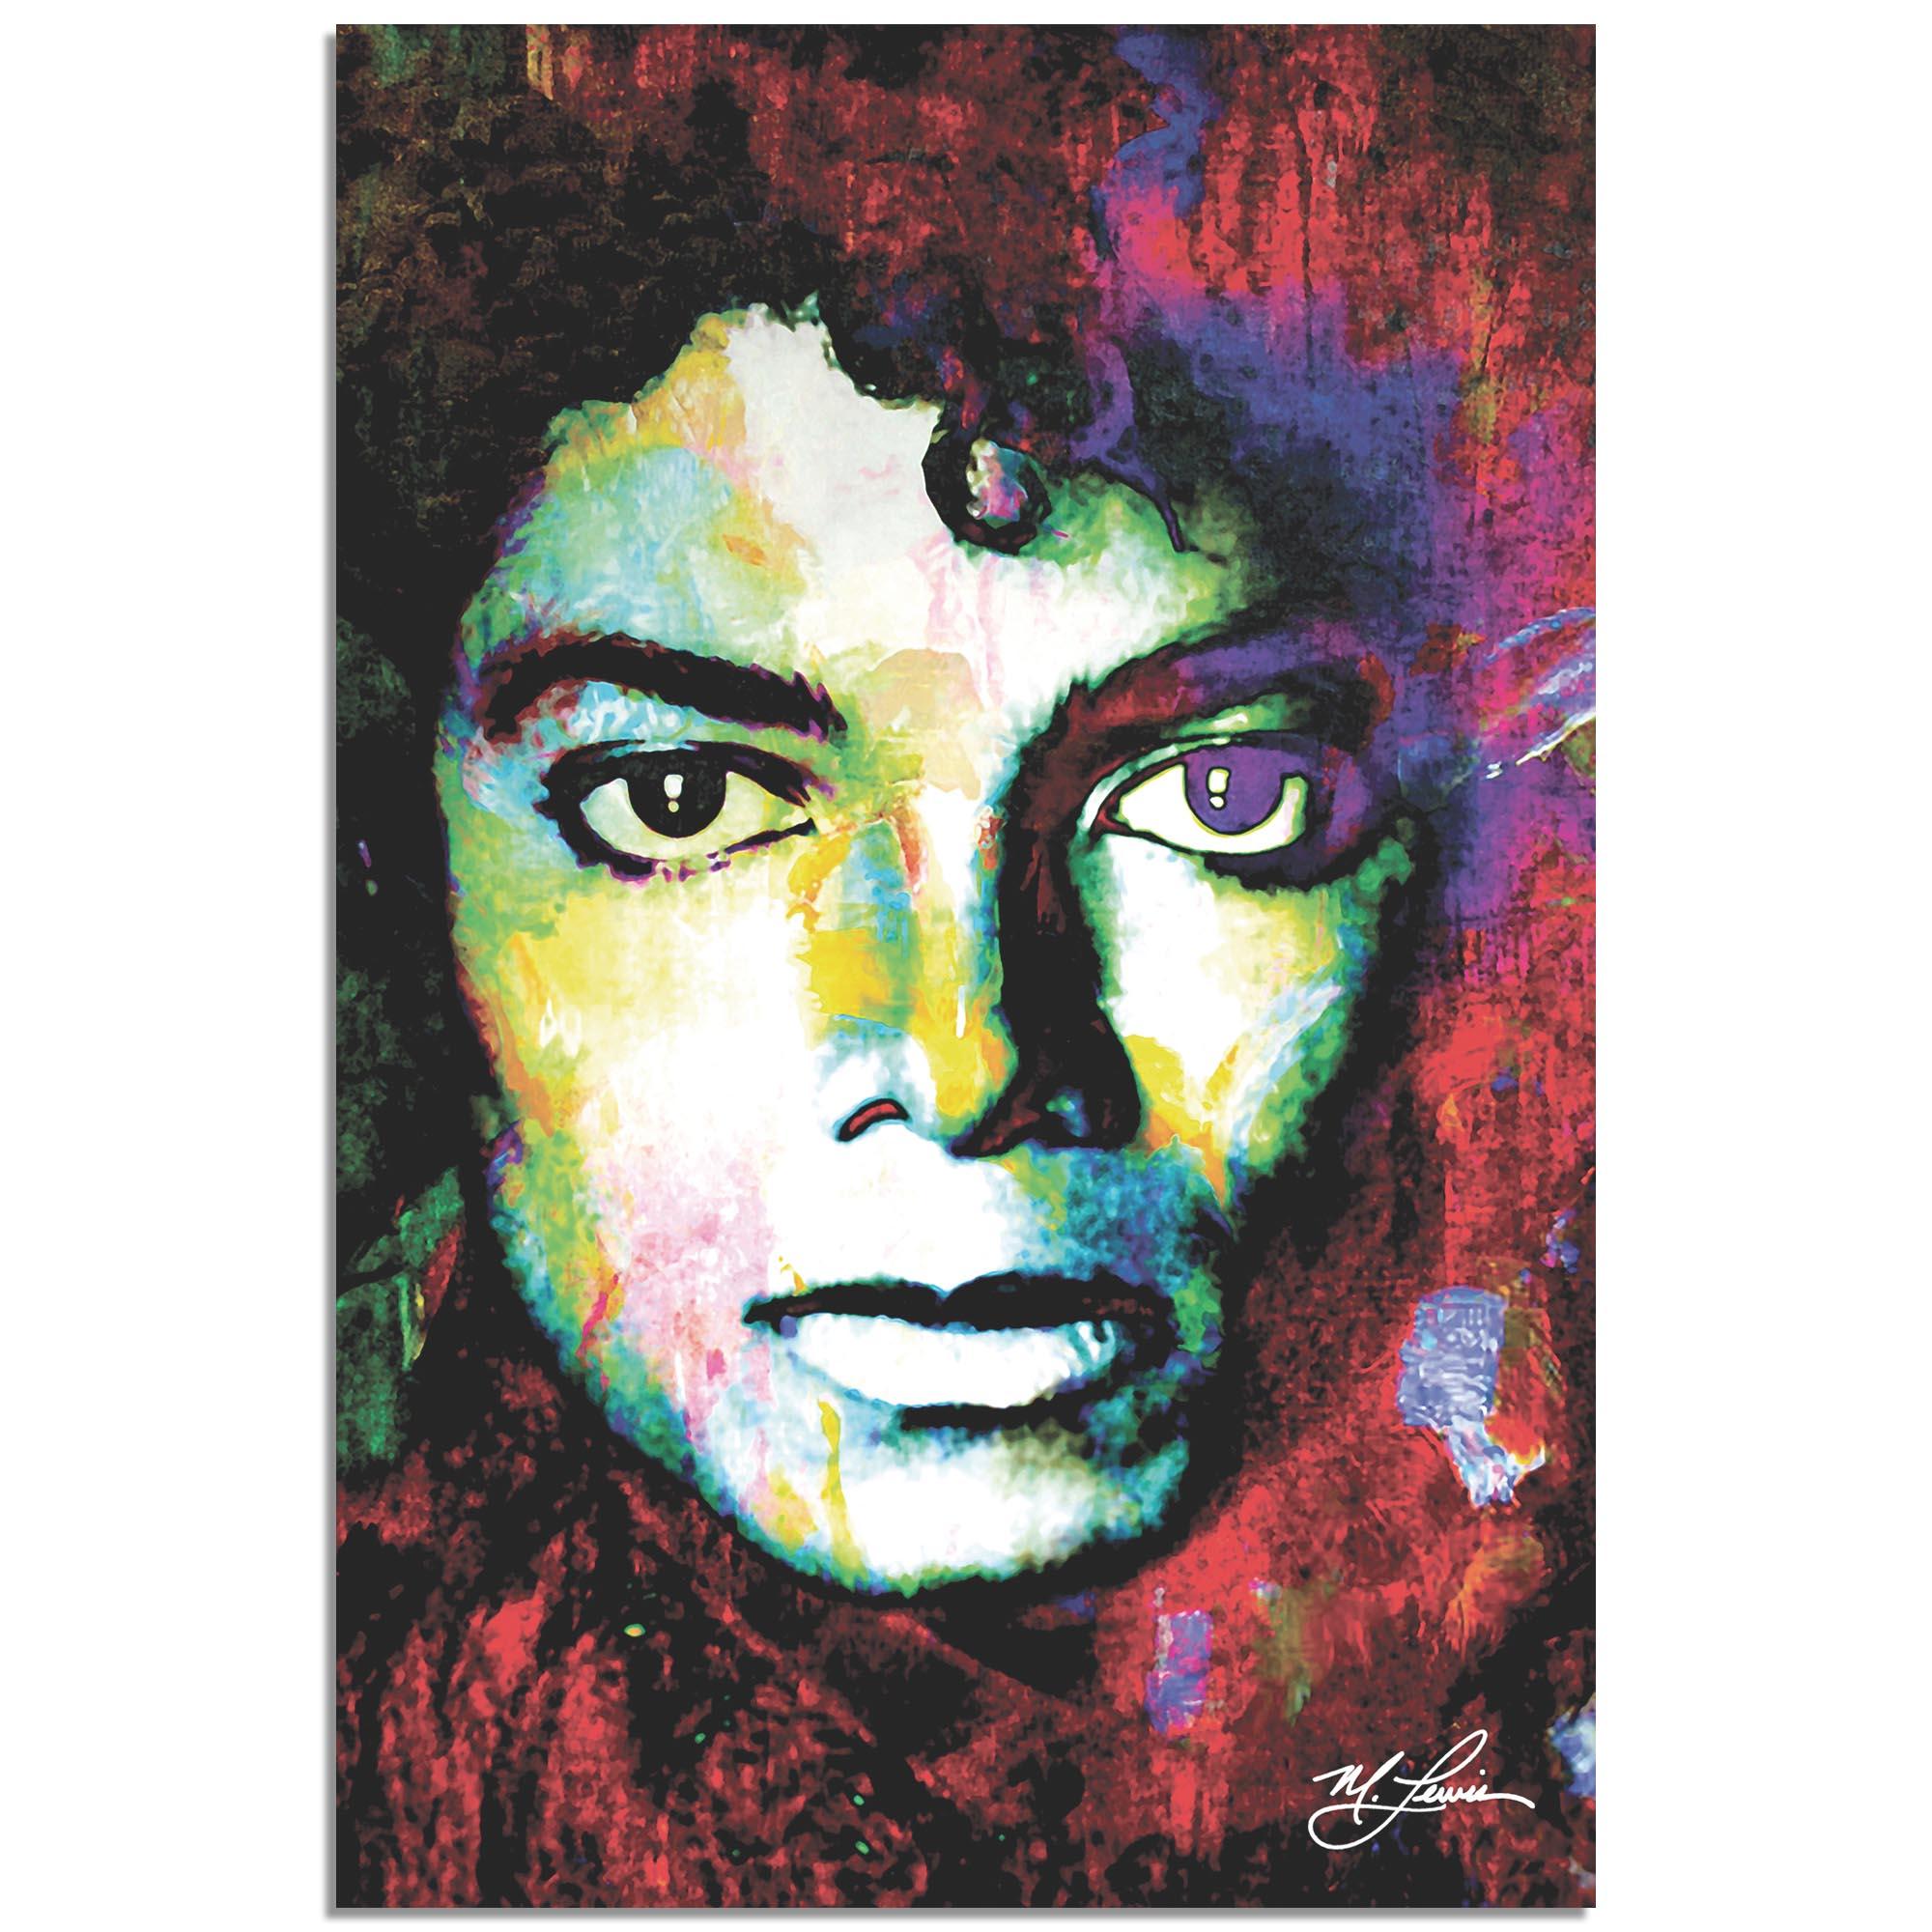 Mark Lewis 'Michael Jackson Study 1' 22in x 32in Celebrity Pop Art on Metal or Plexiglass